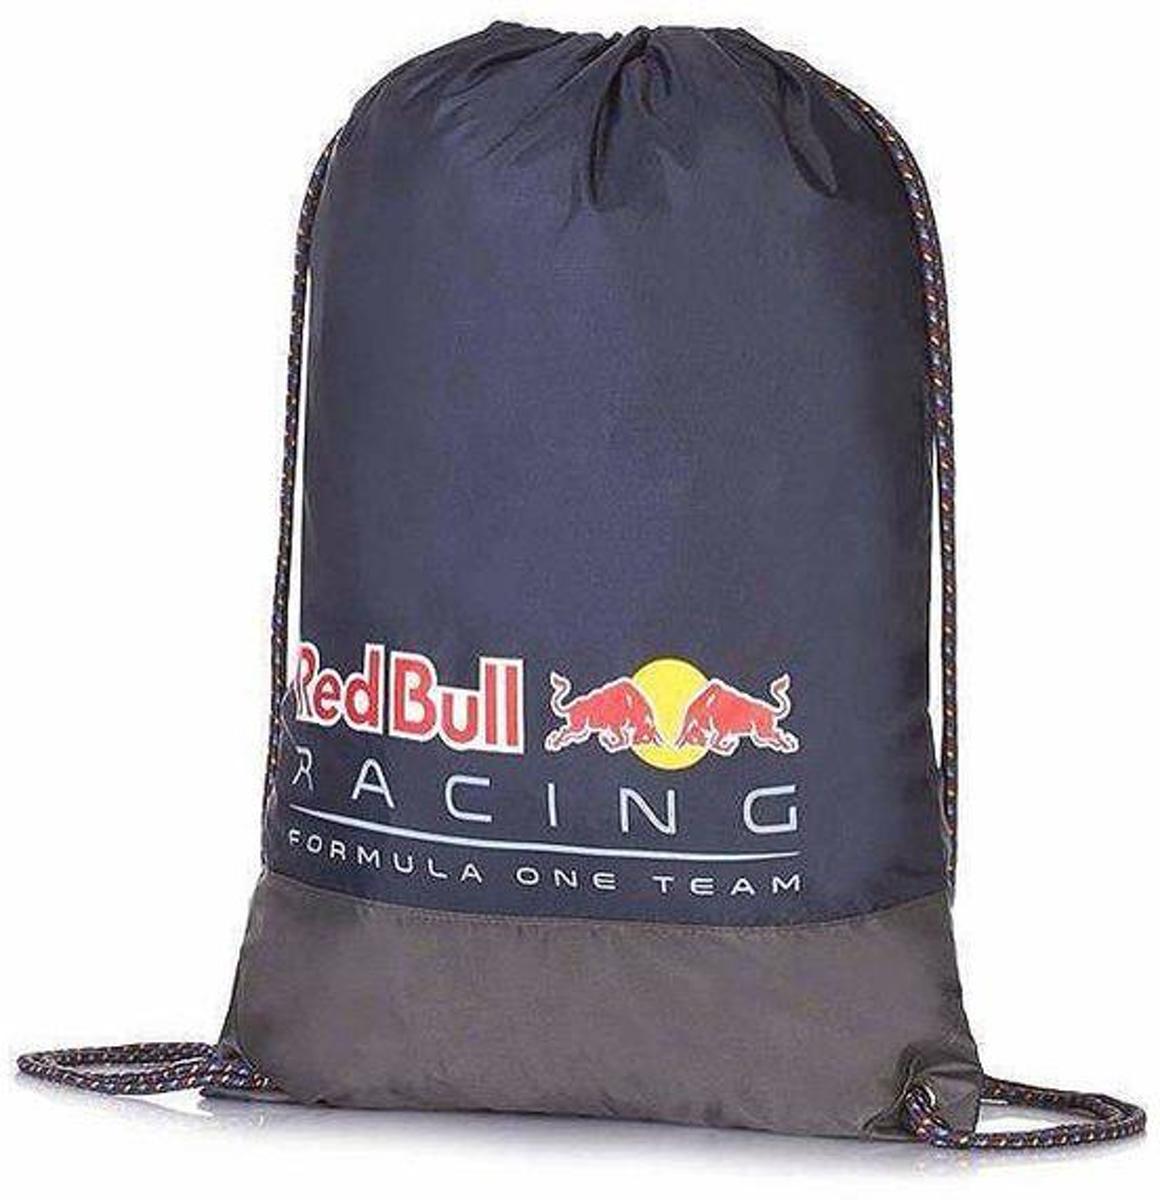 Red Bull Racing Max Verstappen Gym Bag / Rugzak